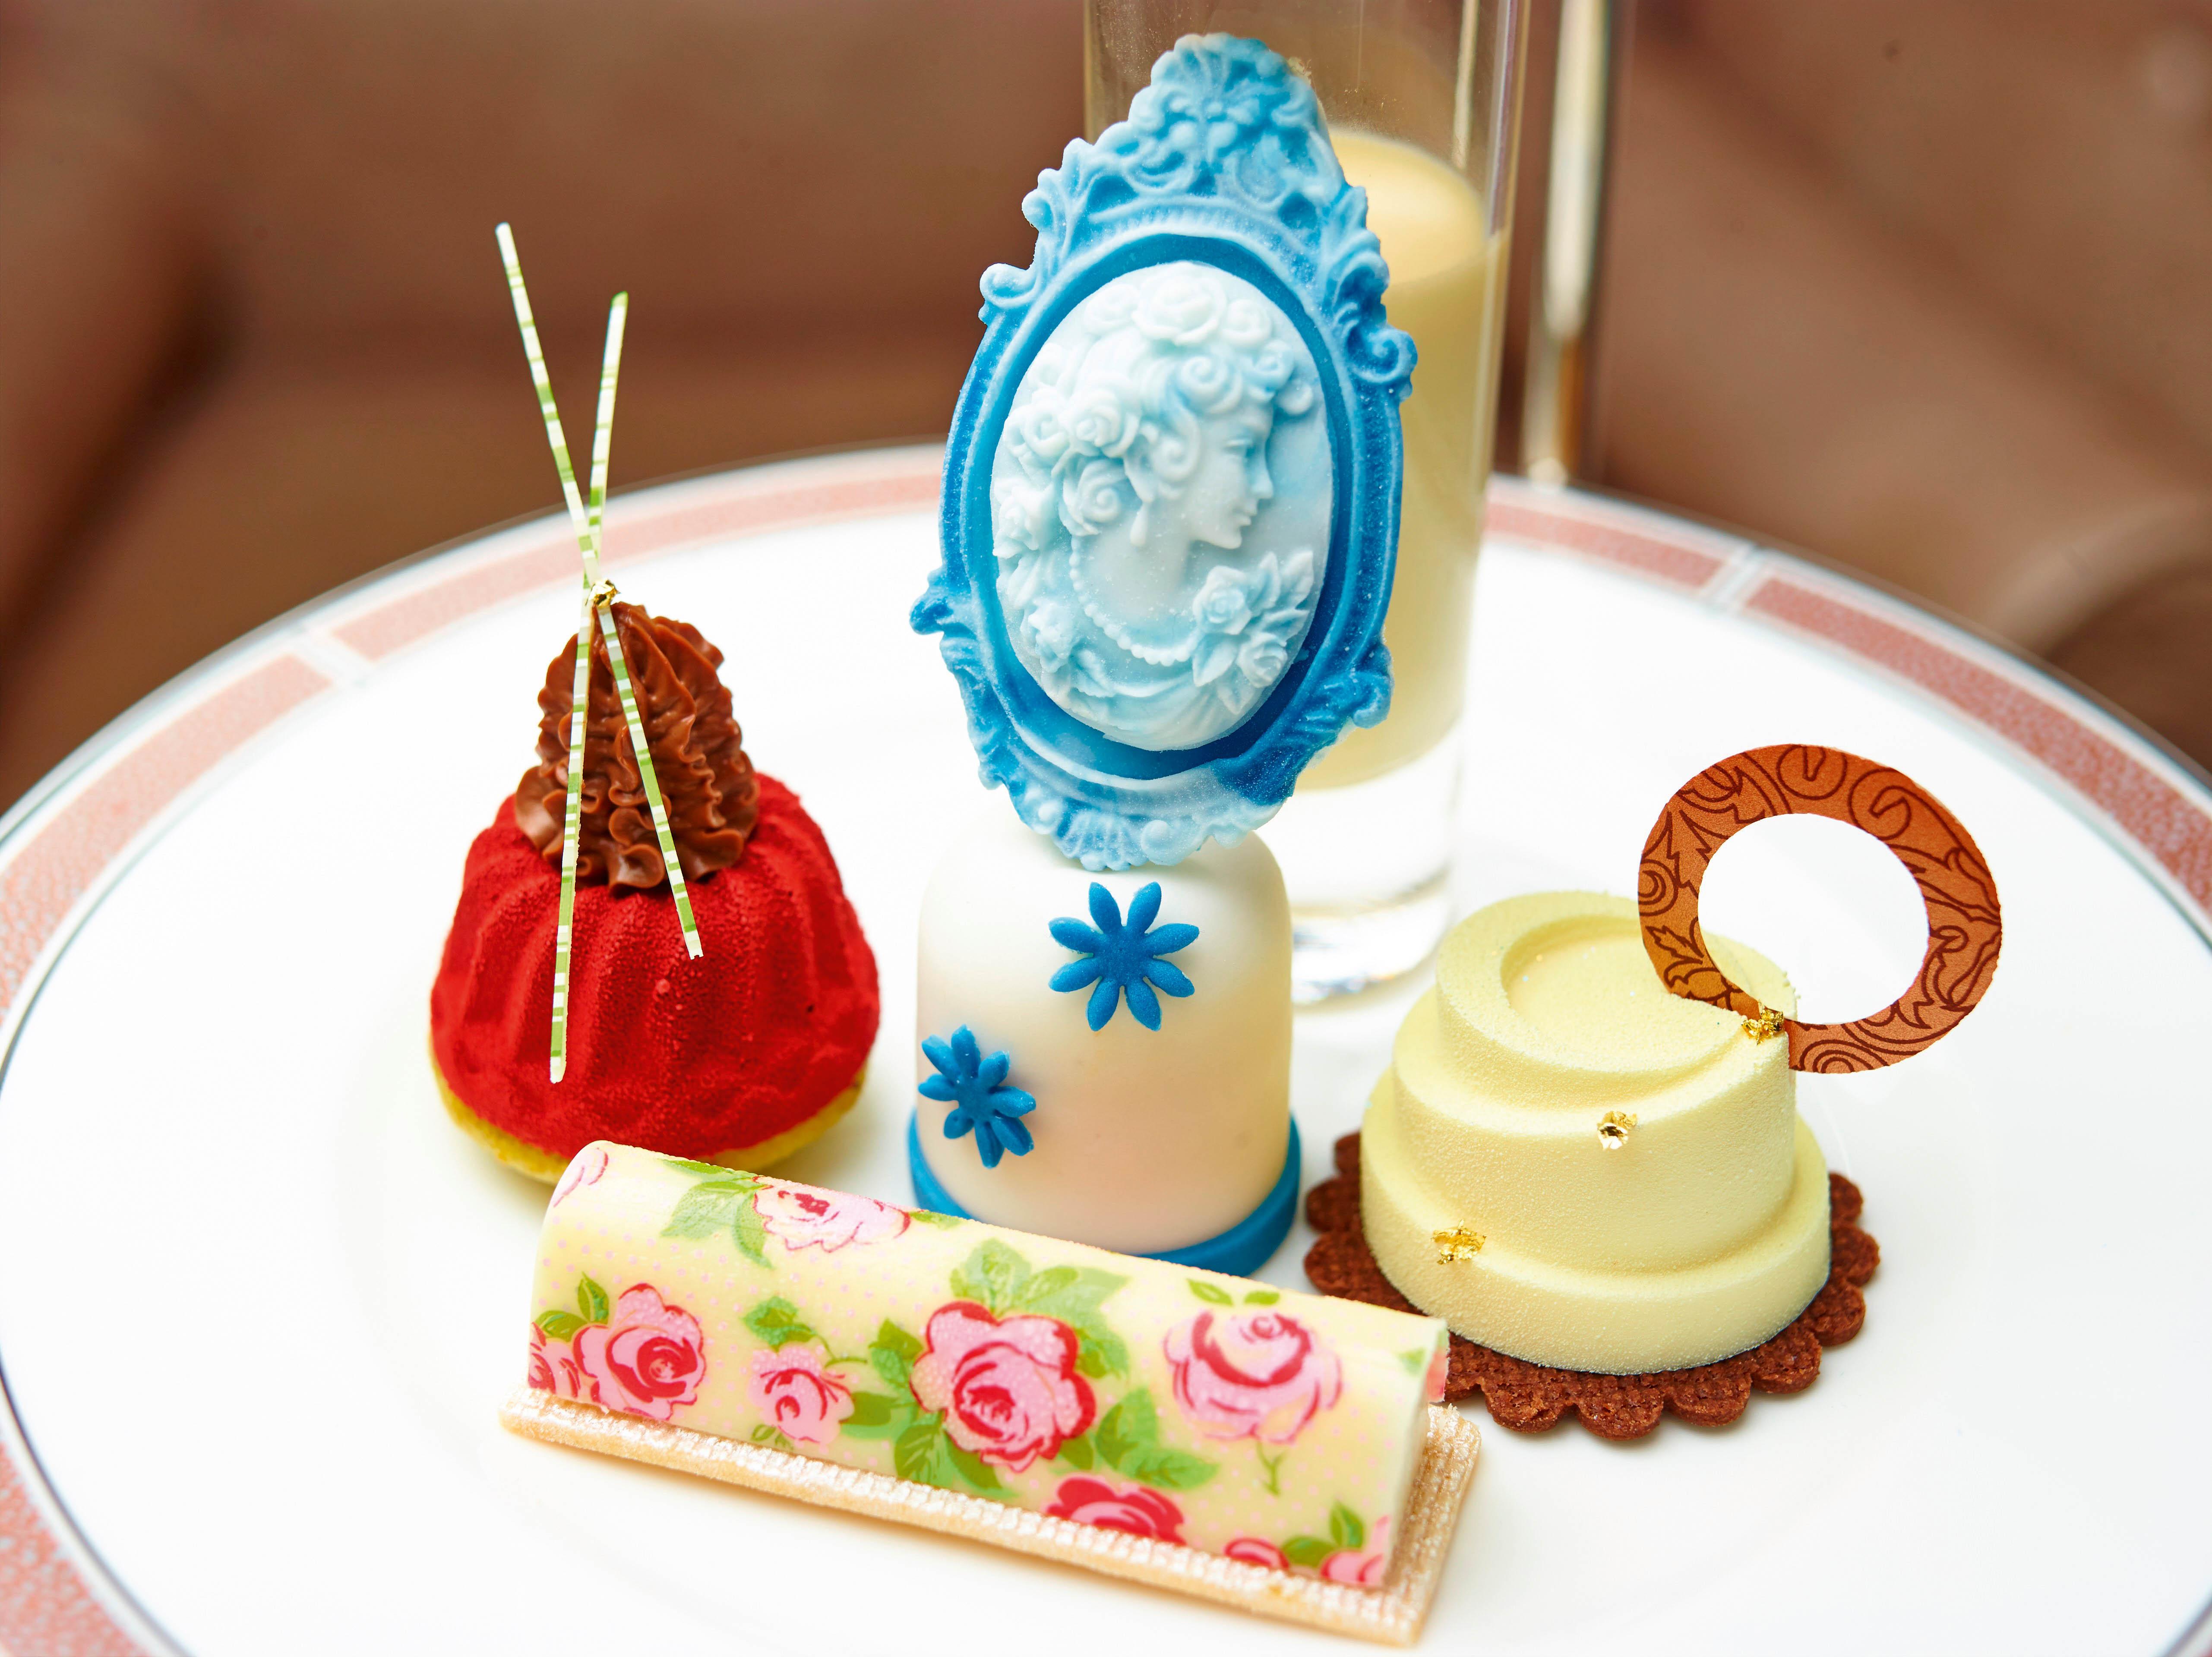 Cherish Finden miniature cakes and pastries